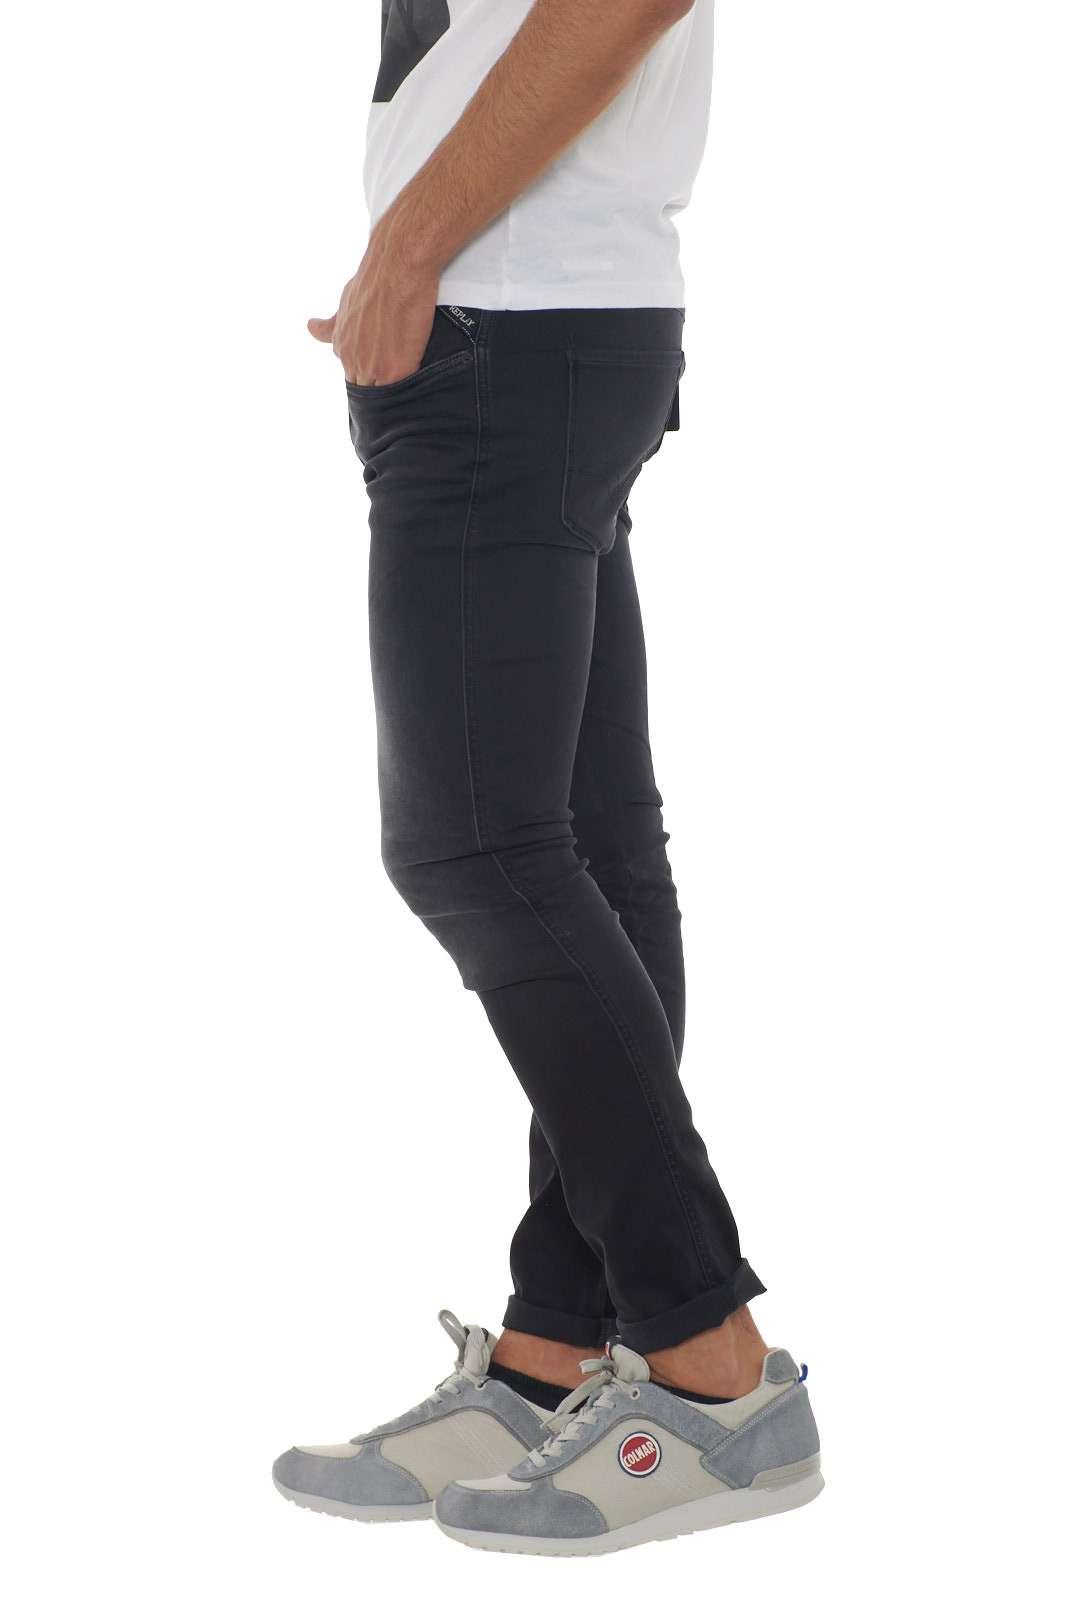 https://www.parmax.com/media/catalog/product/a/i/AI-Outlet_Parmax-Pantalone-Uomo-Replay-M91400066106B-B.jpg